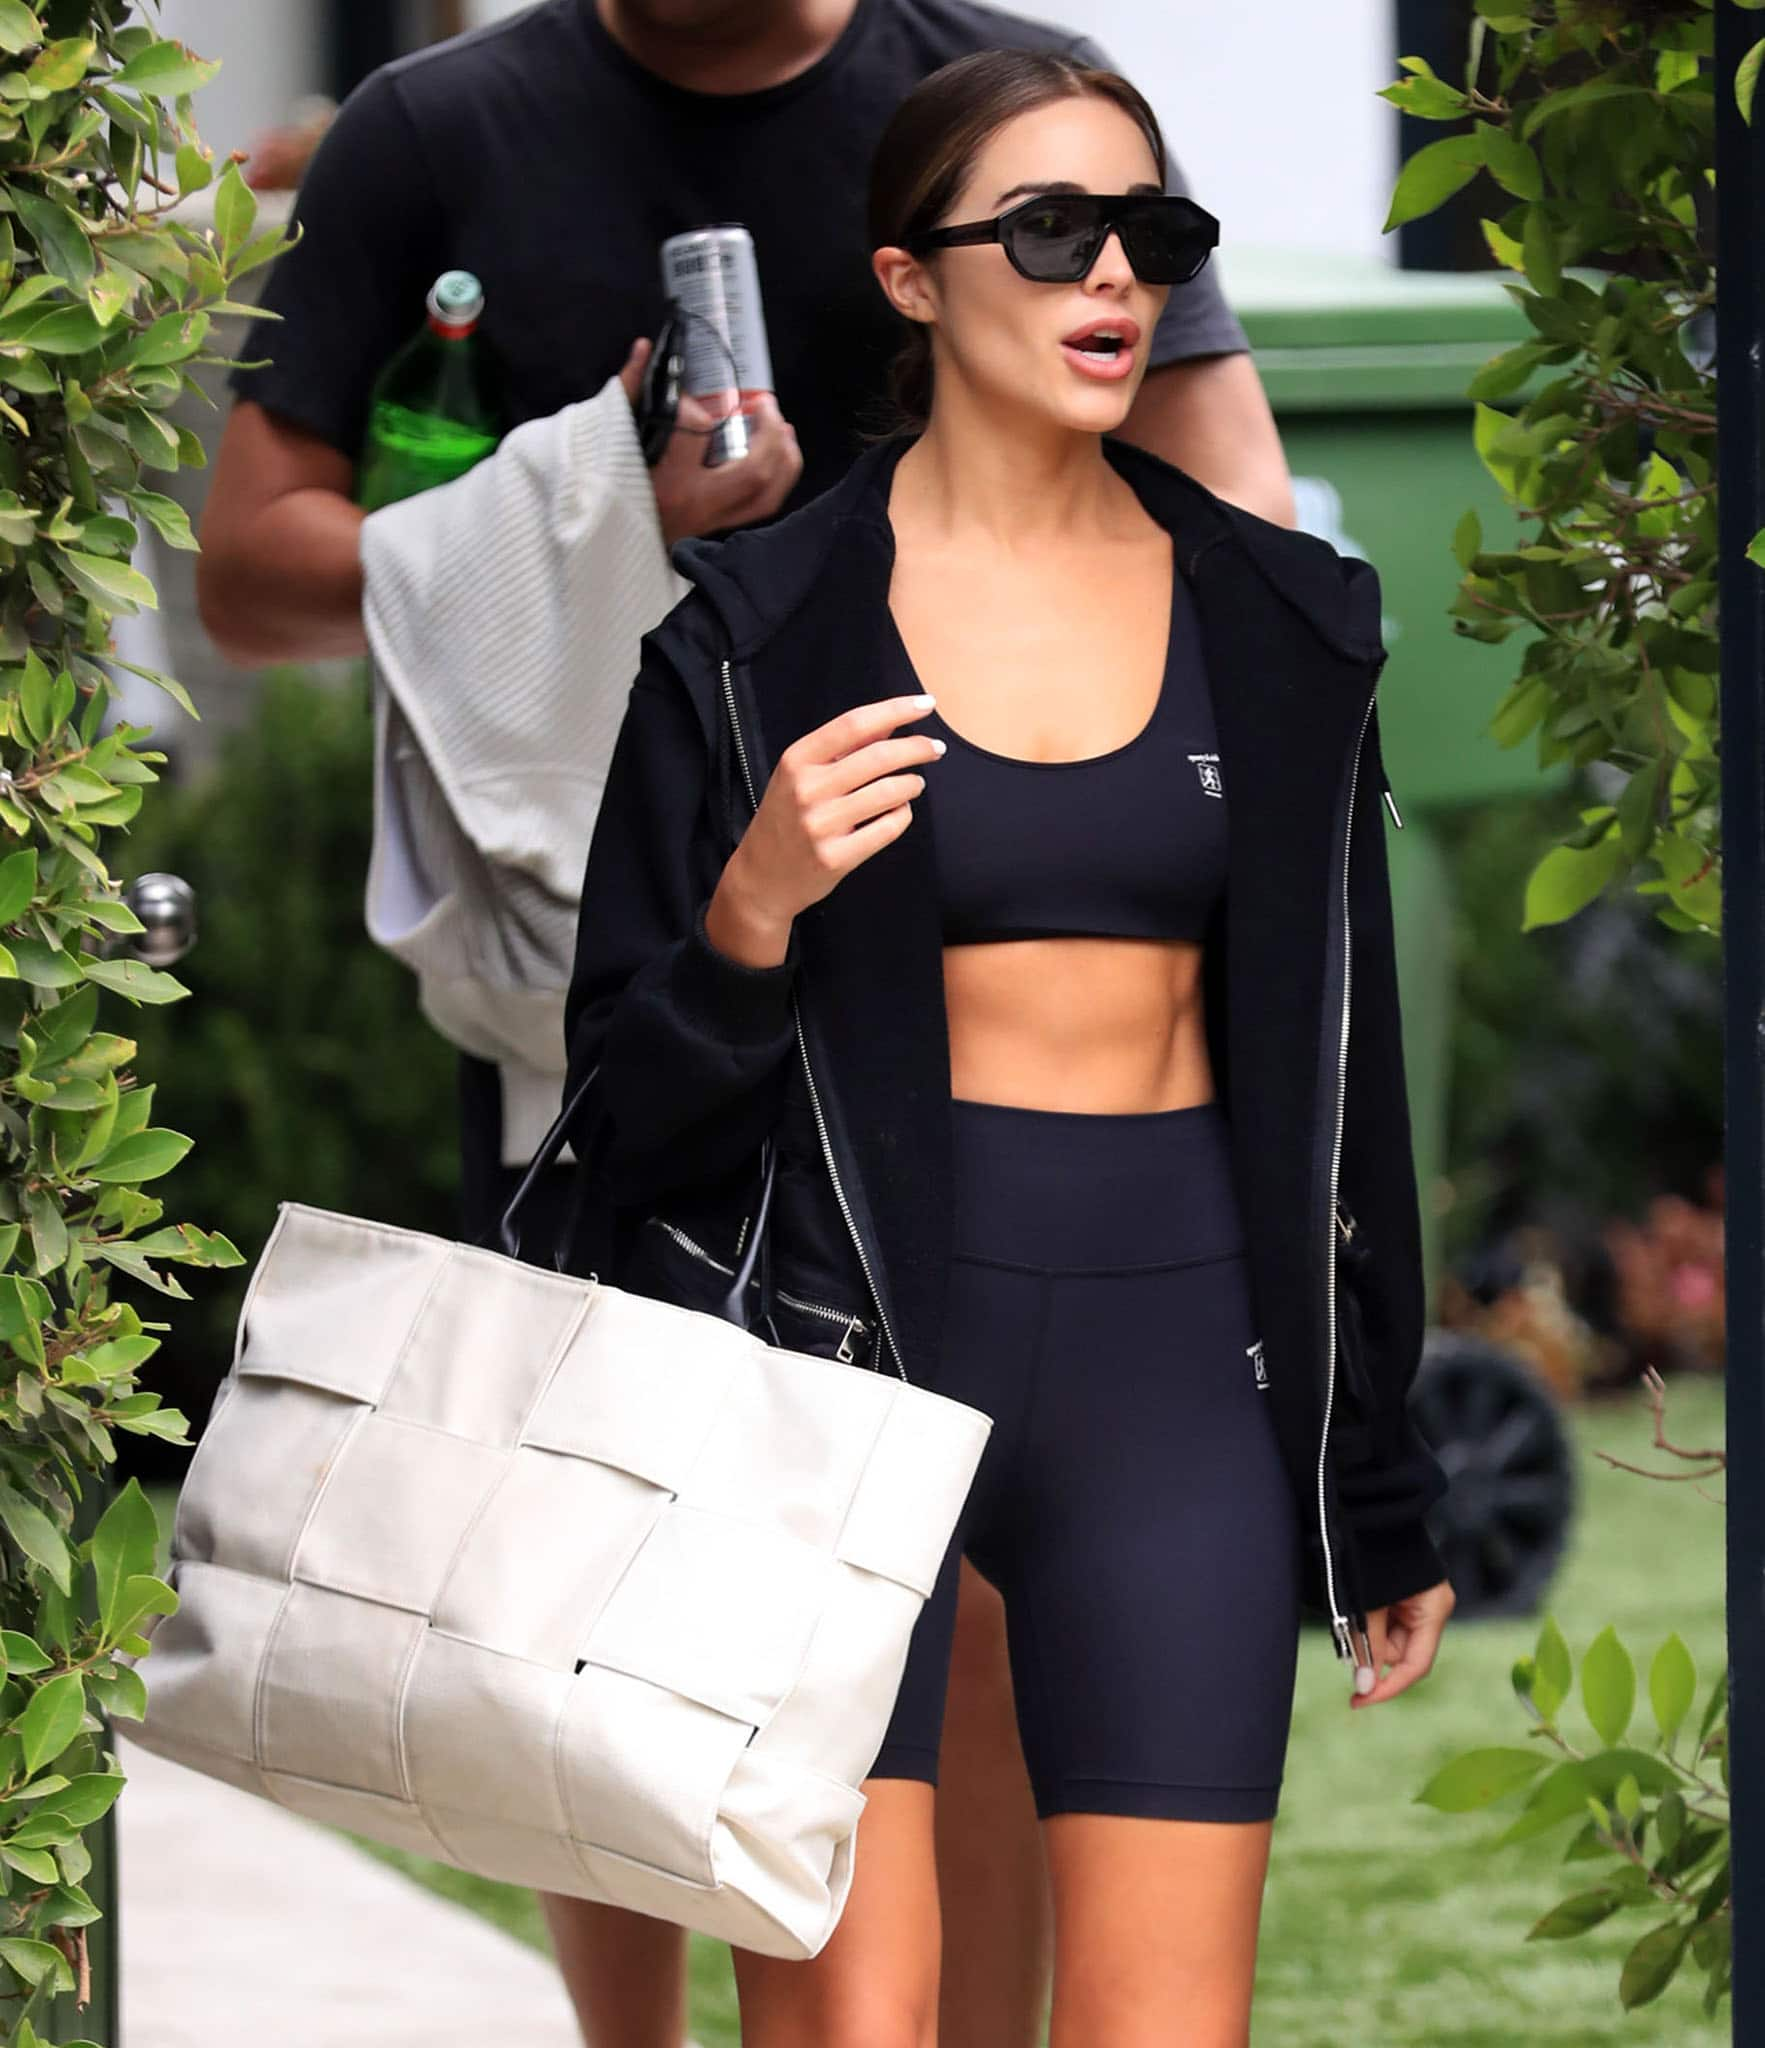 Olivia Culpo carries a Bottega Veneta Arca tote and hides eyes behind Karen Walker sunnies